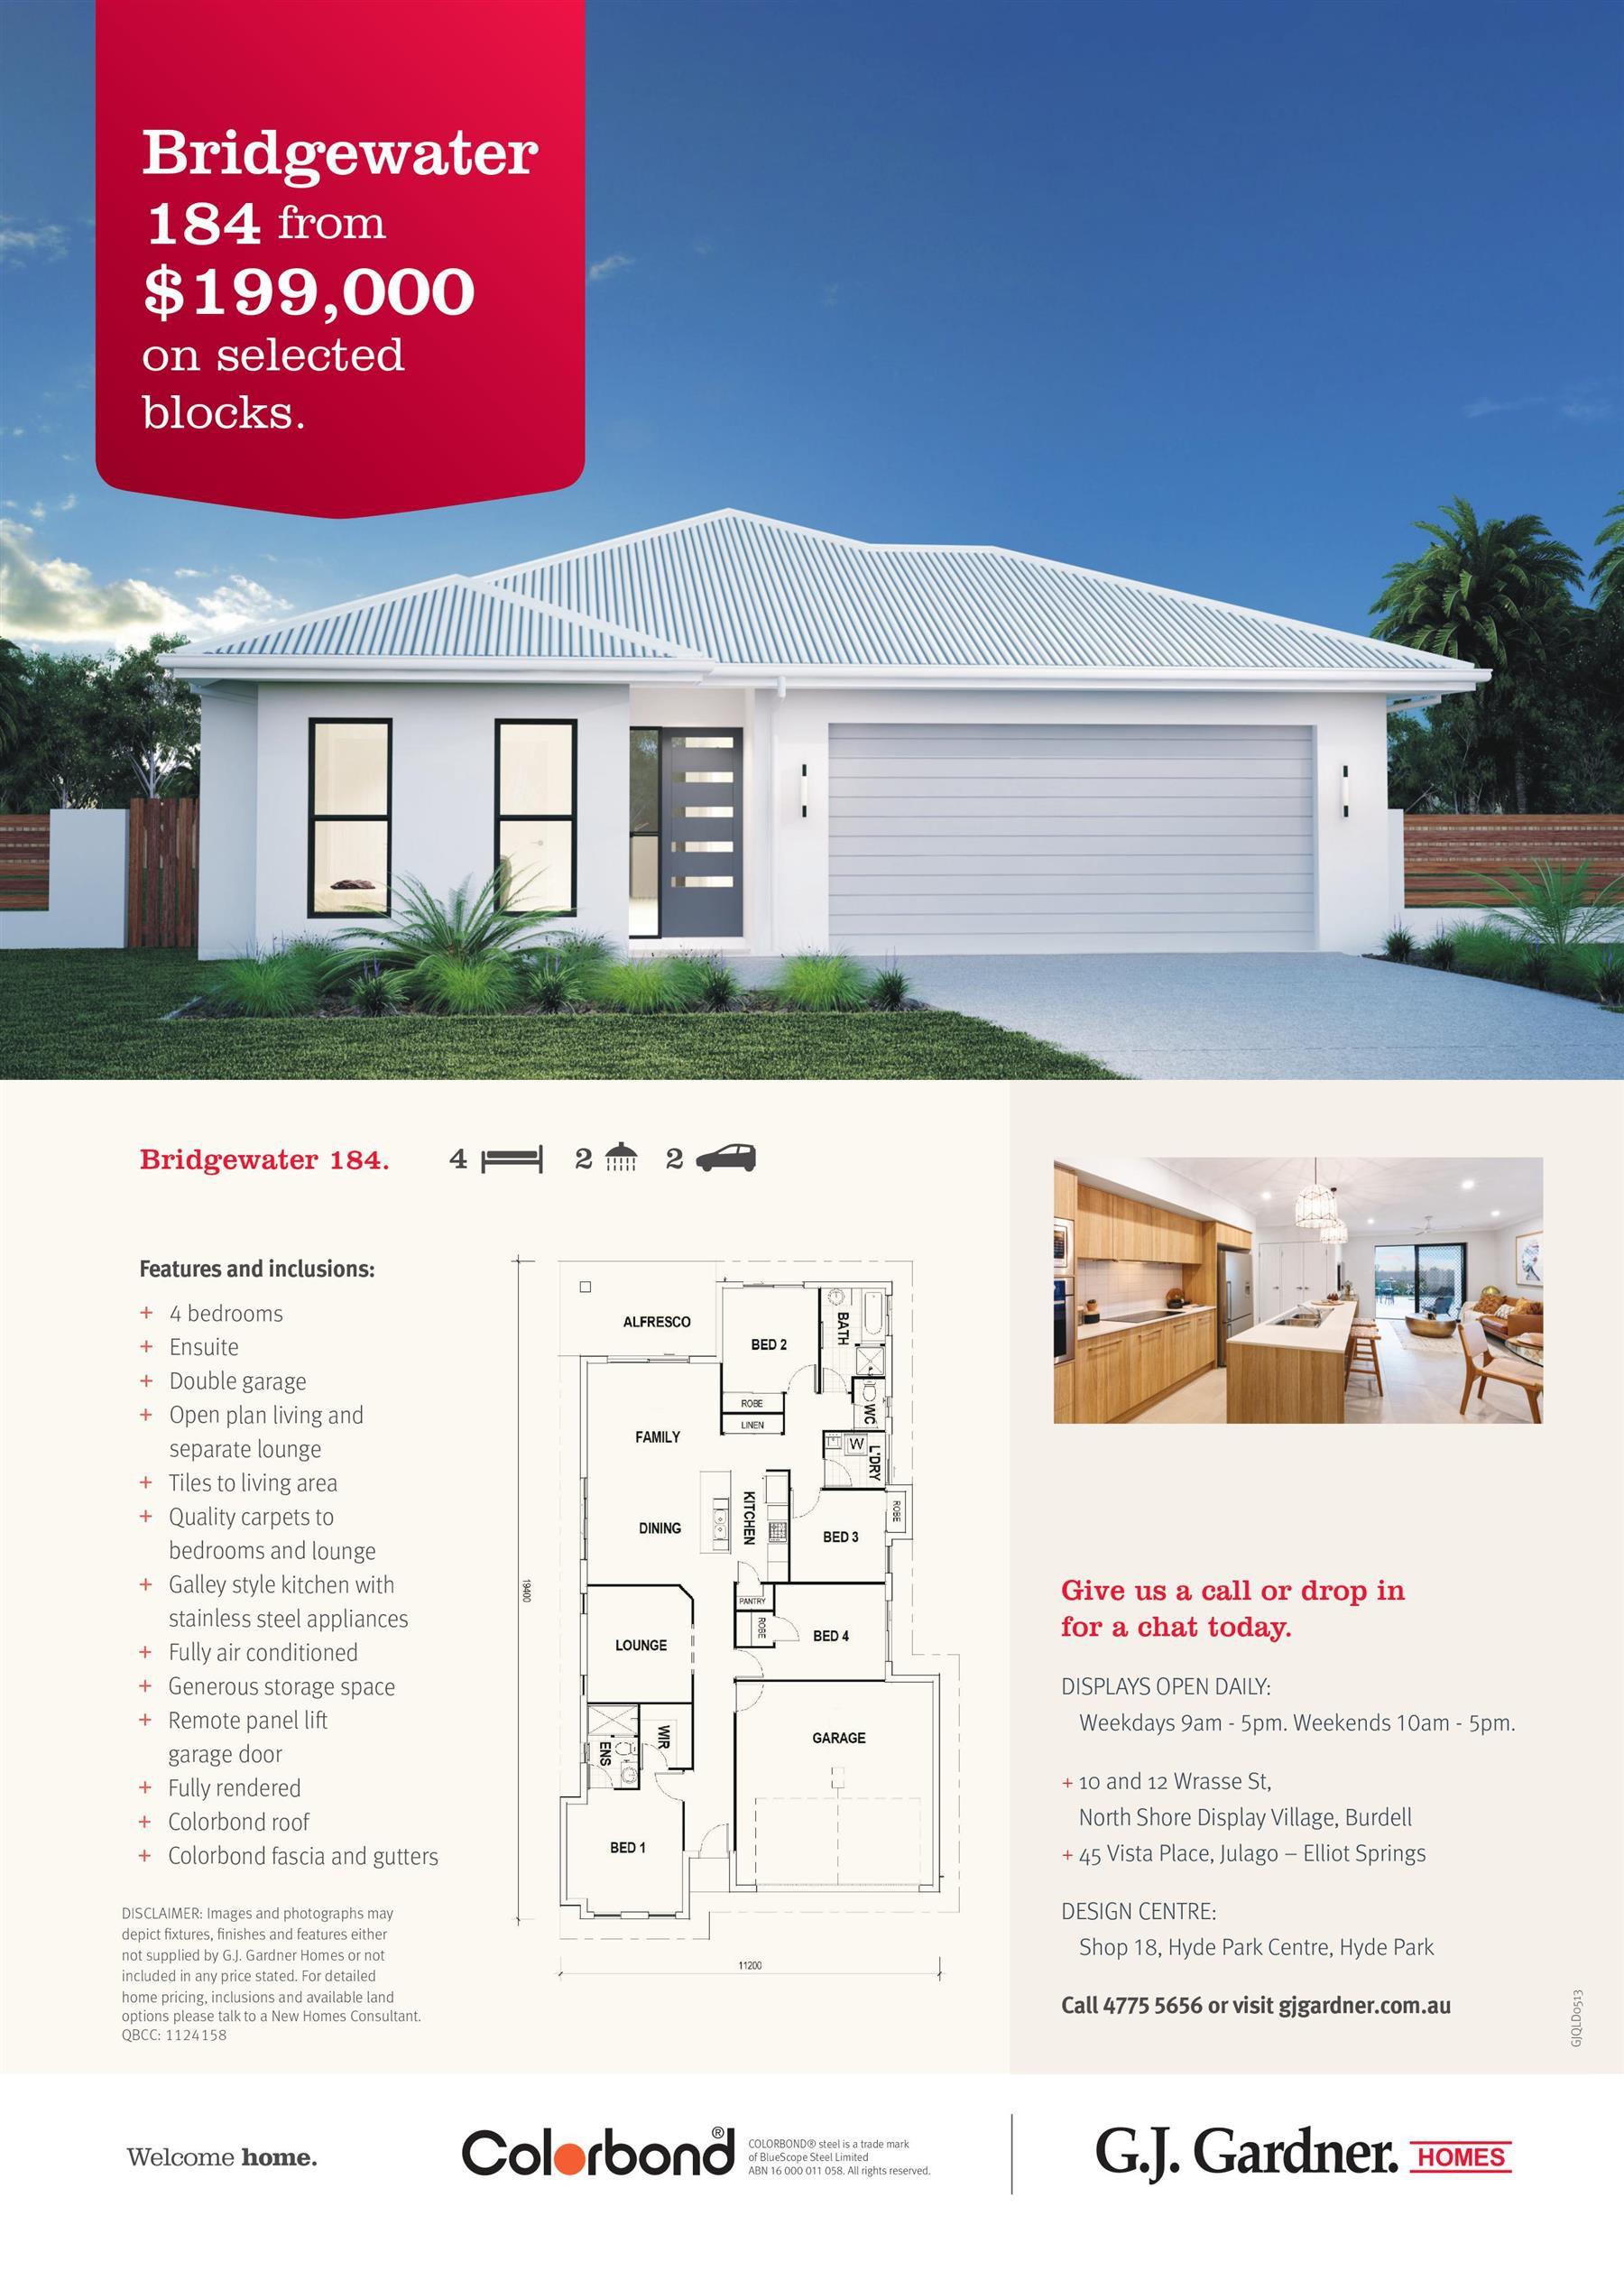 Bridgewater 184 from $199,000 on selected blocks